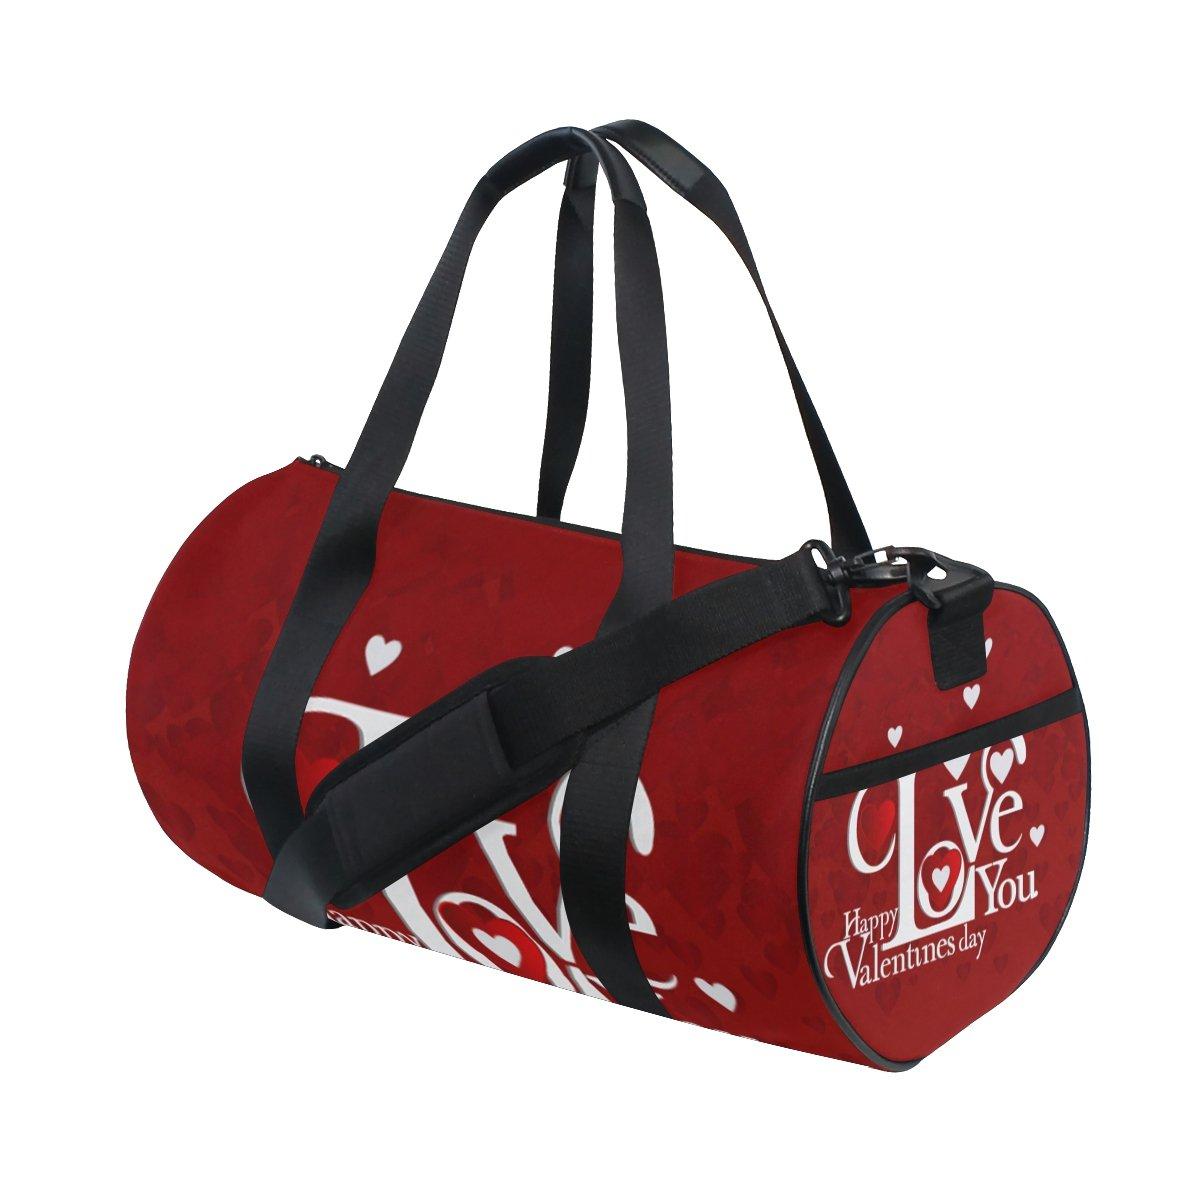 U LIFE Valentines Day Red Heart Love You Sports Gym Shoulder Handy Duffel Bags for Women Men Kids Boys Girls